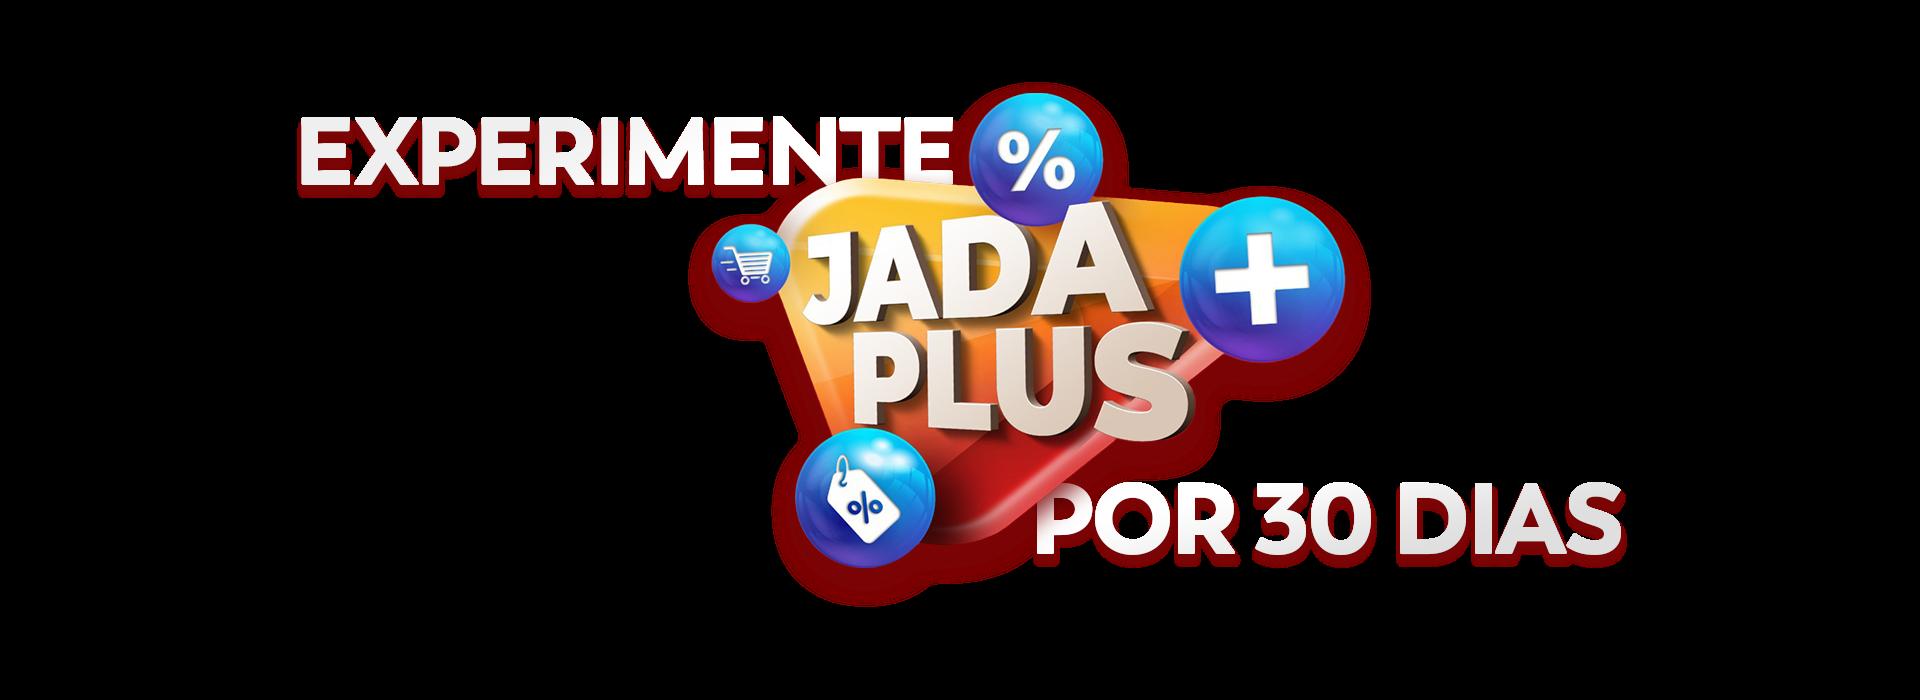 Banner Jadapax 30 dias